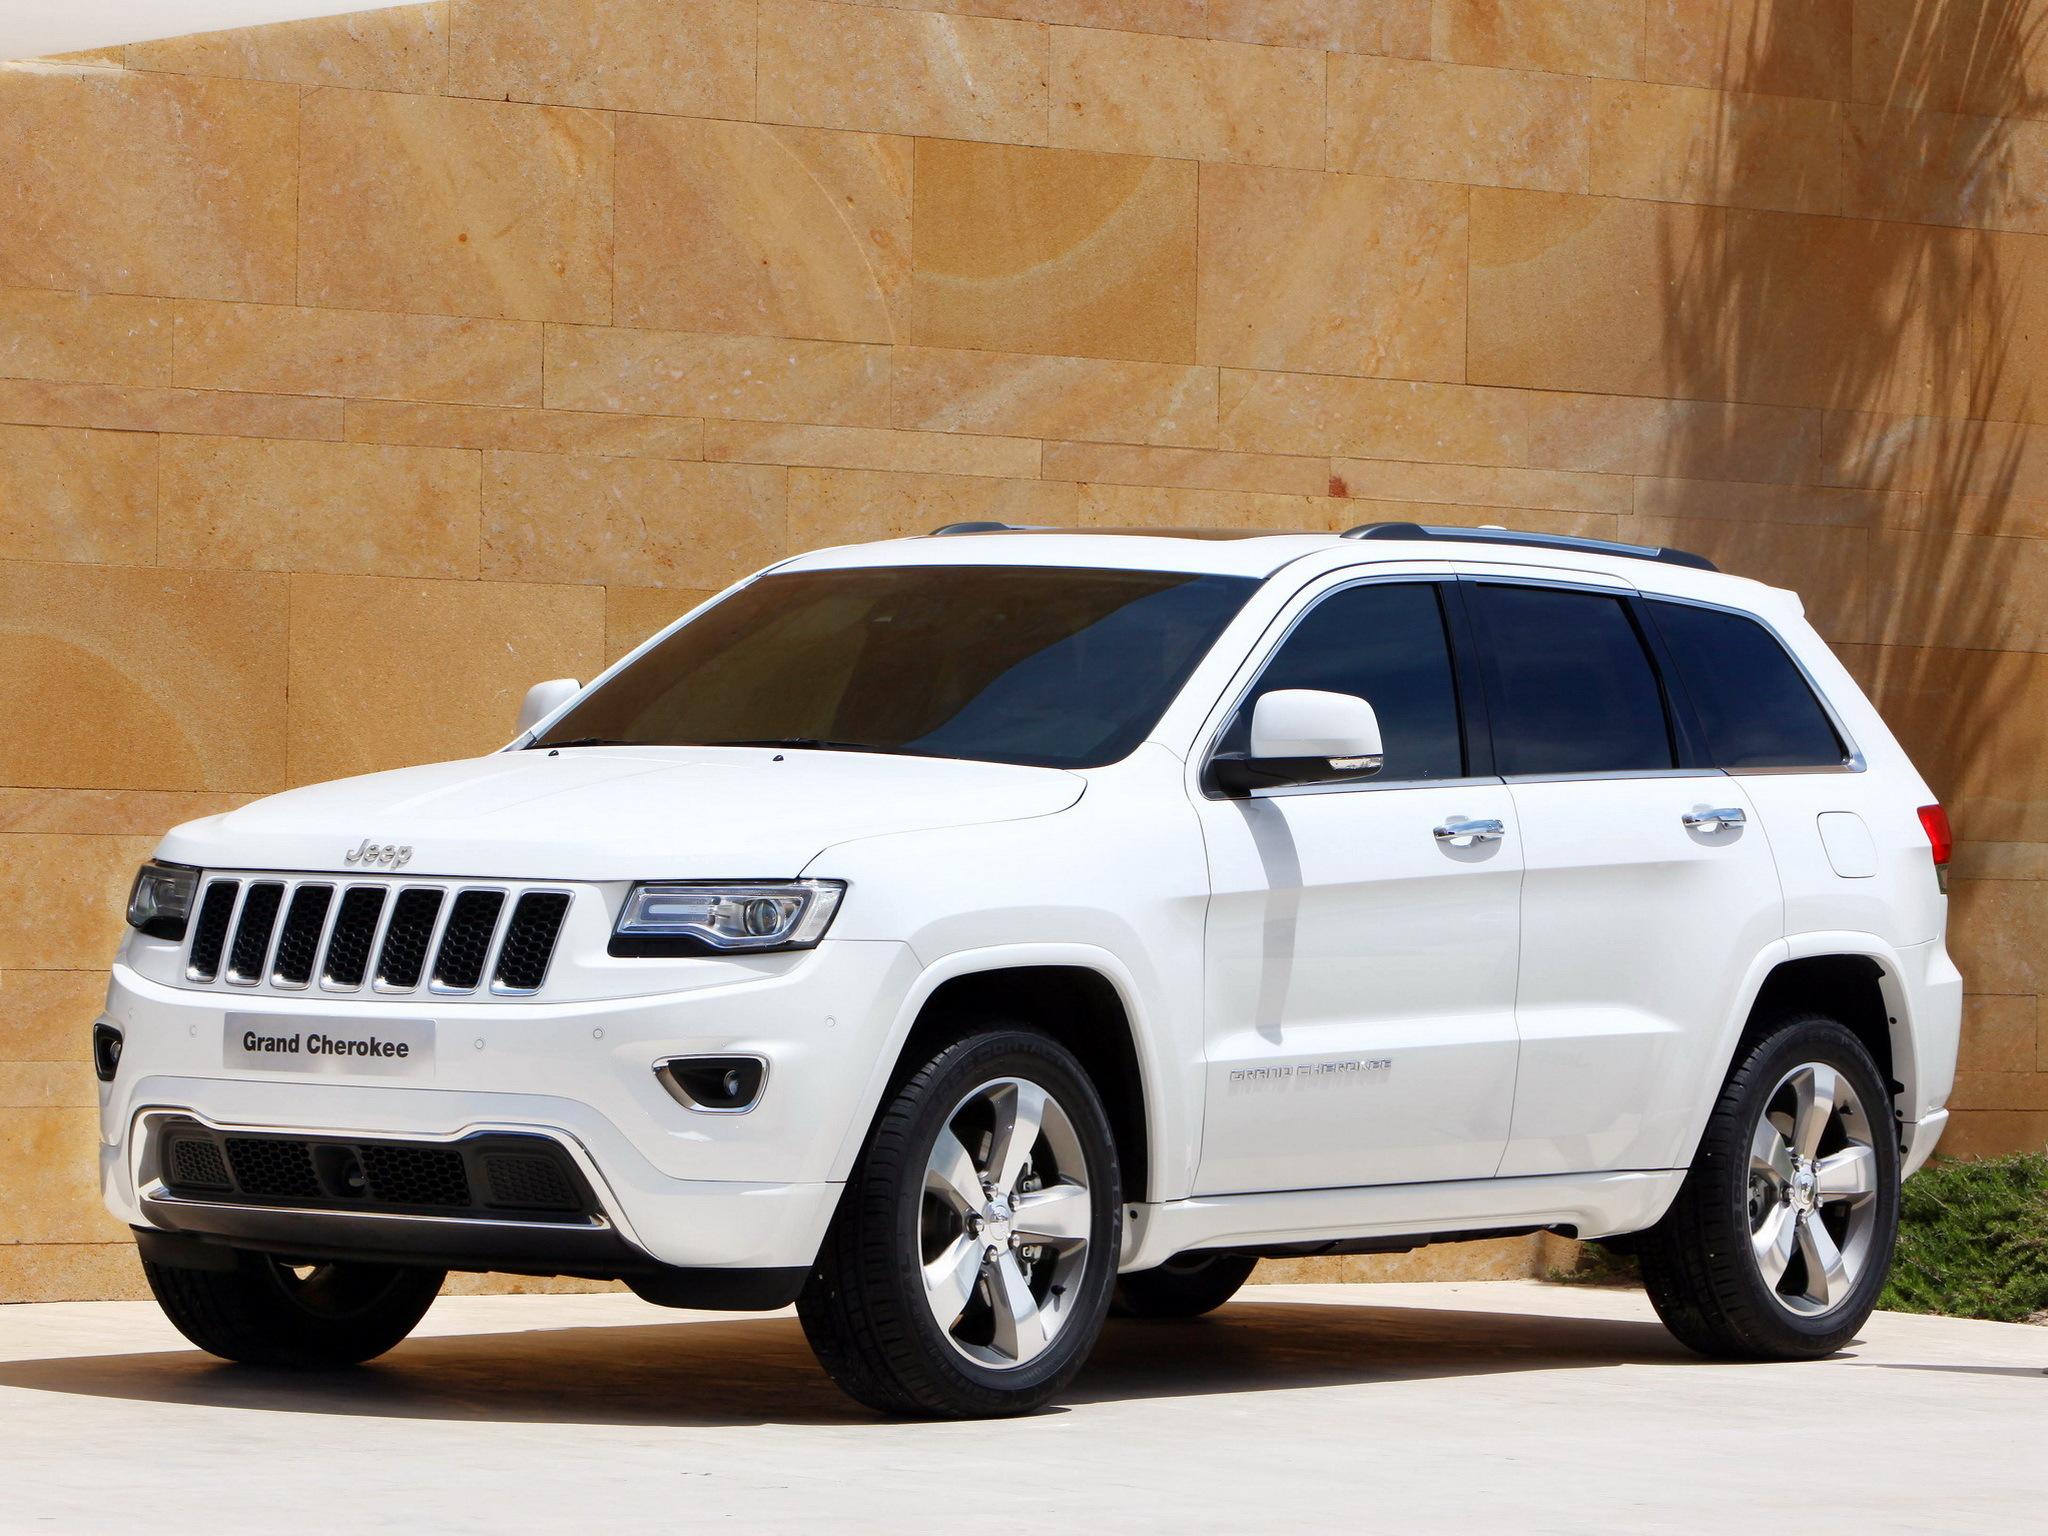 wallpaper white jeep sedan grand cherokee land. Black Bedroom Furniture Sets. Home Design Ideas